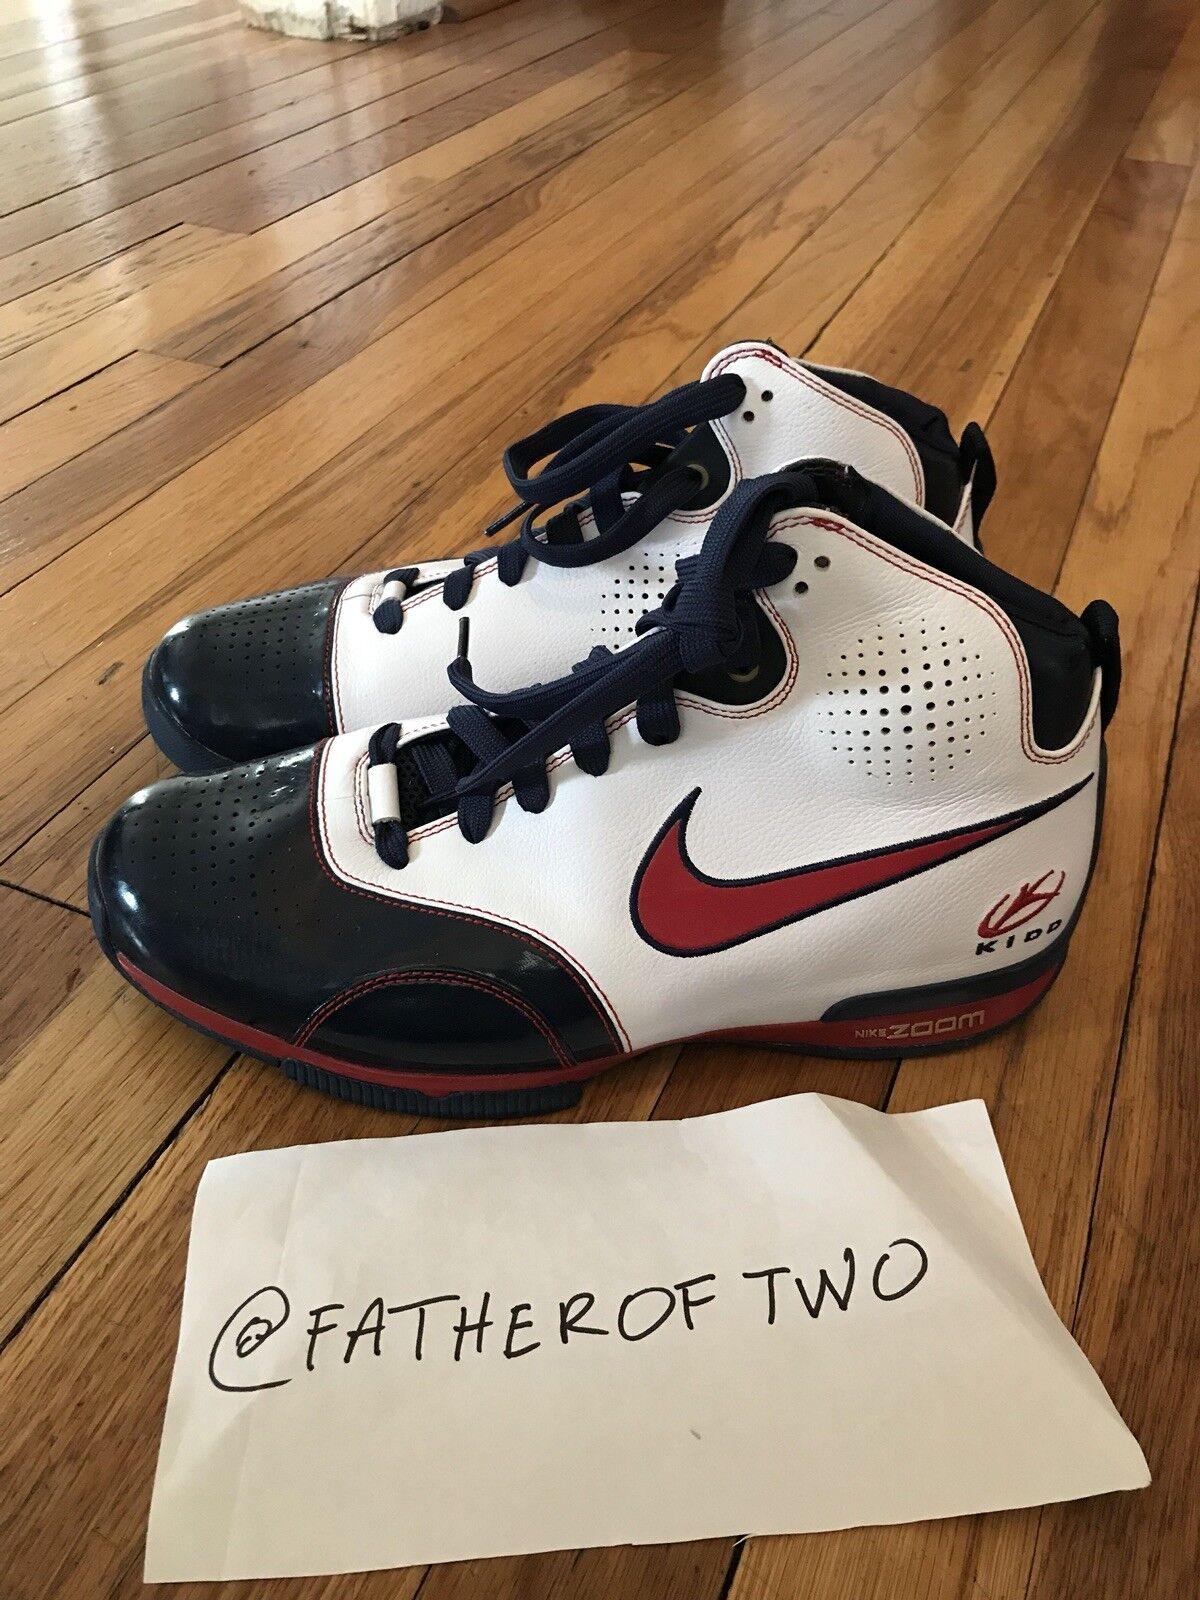 New Authentic Nike Zoom BB Jason Kidd PE '08 USA Olympics SAMPLE US size 9